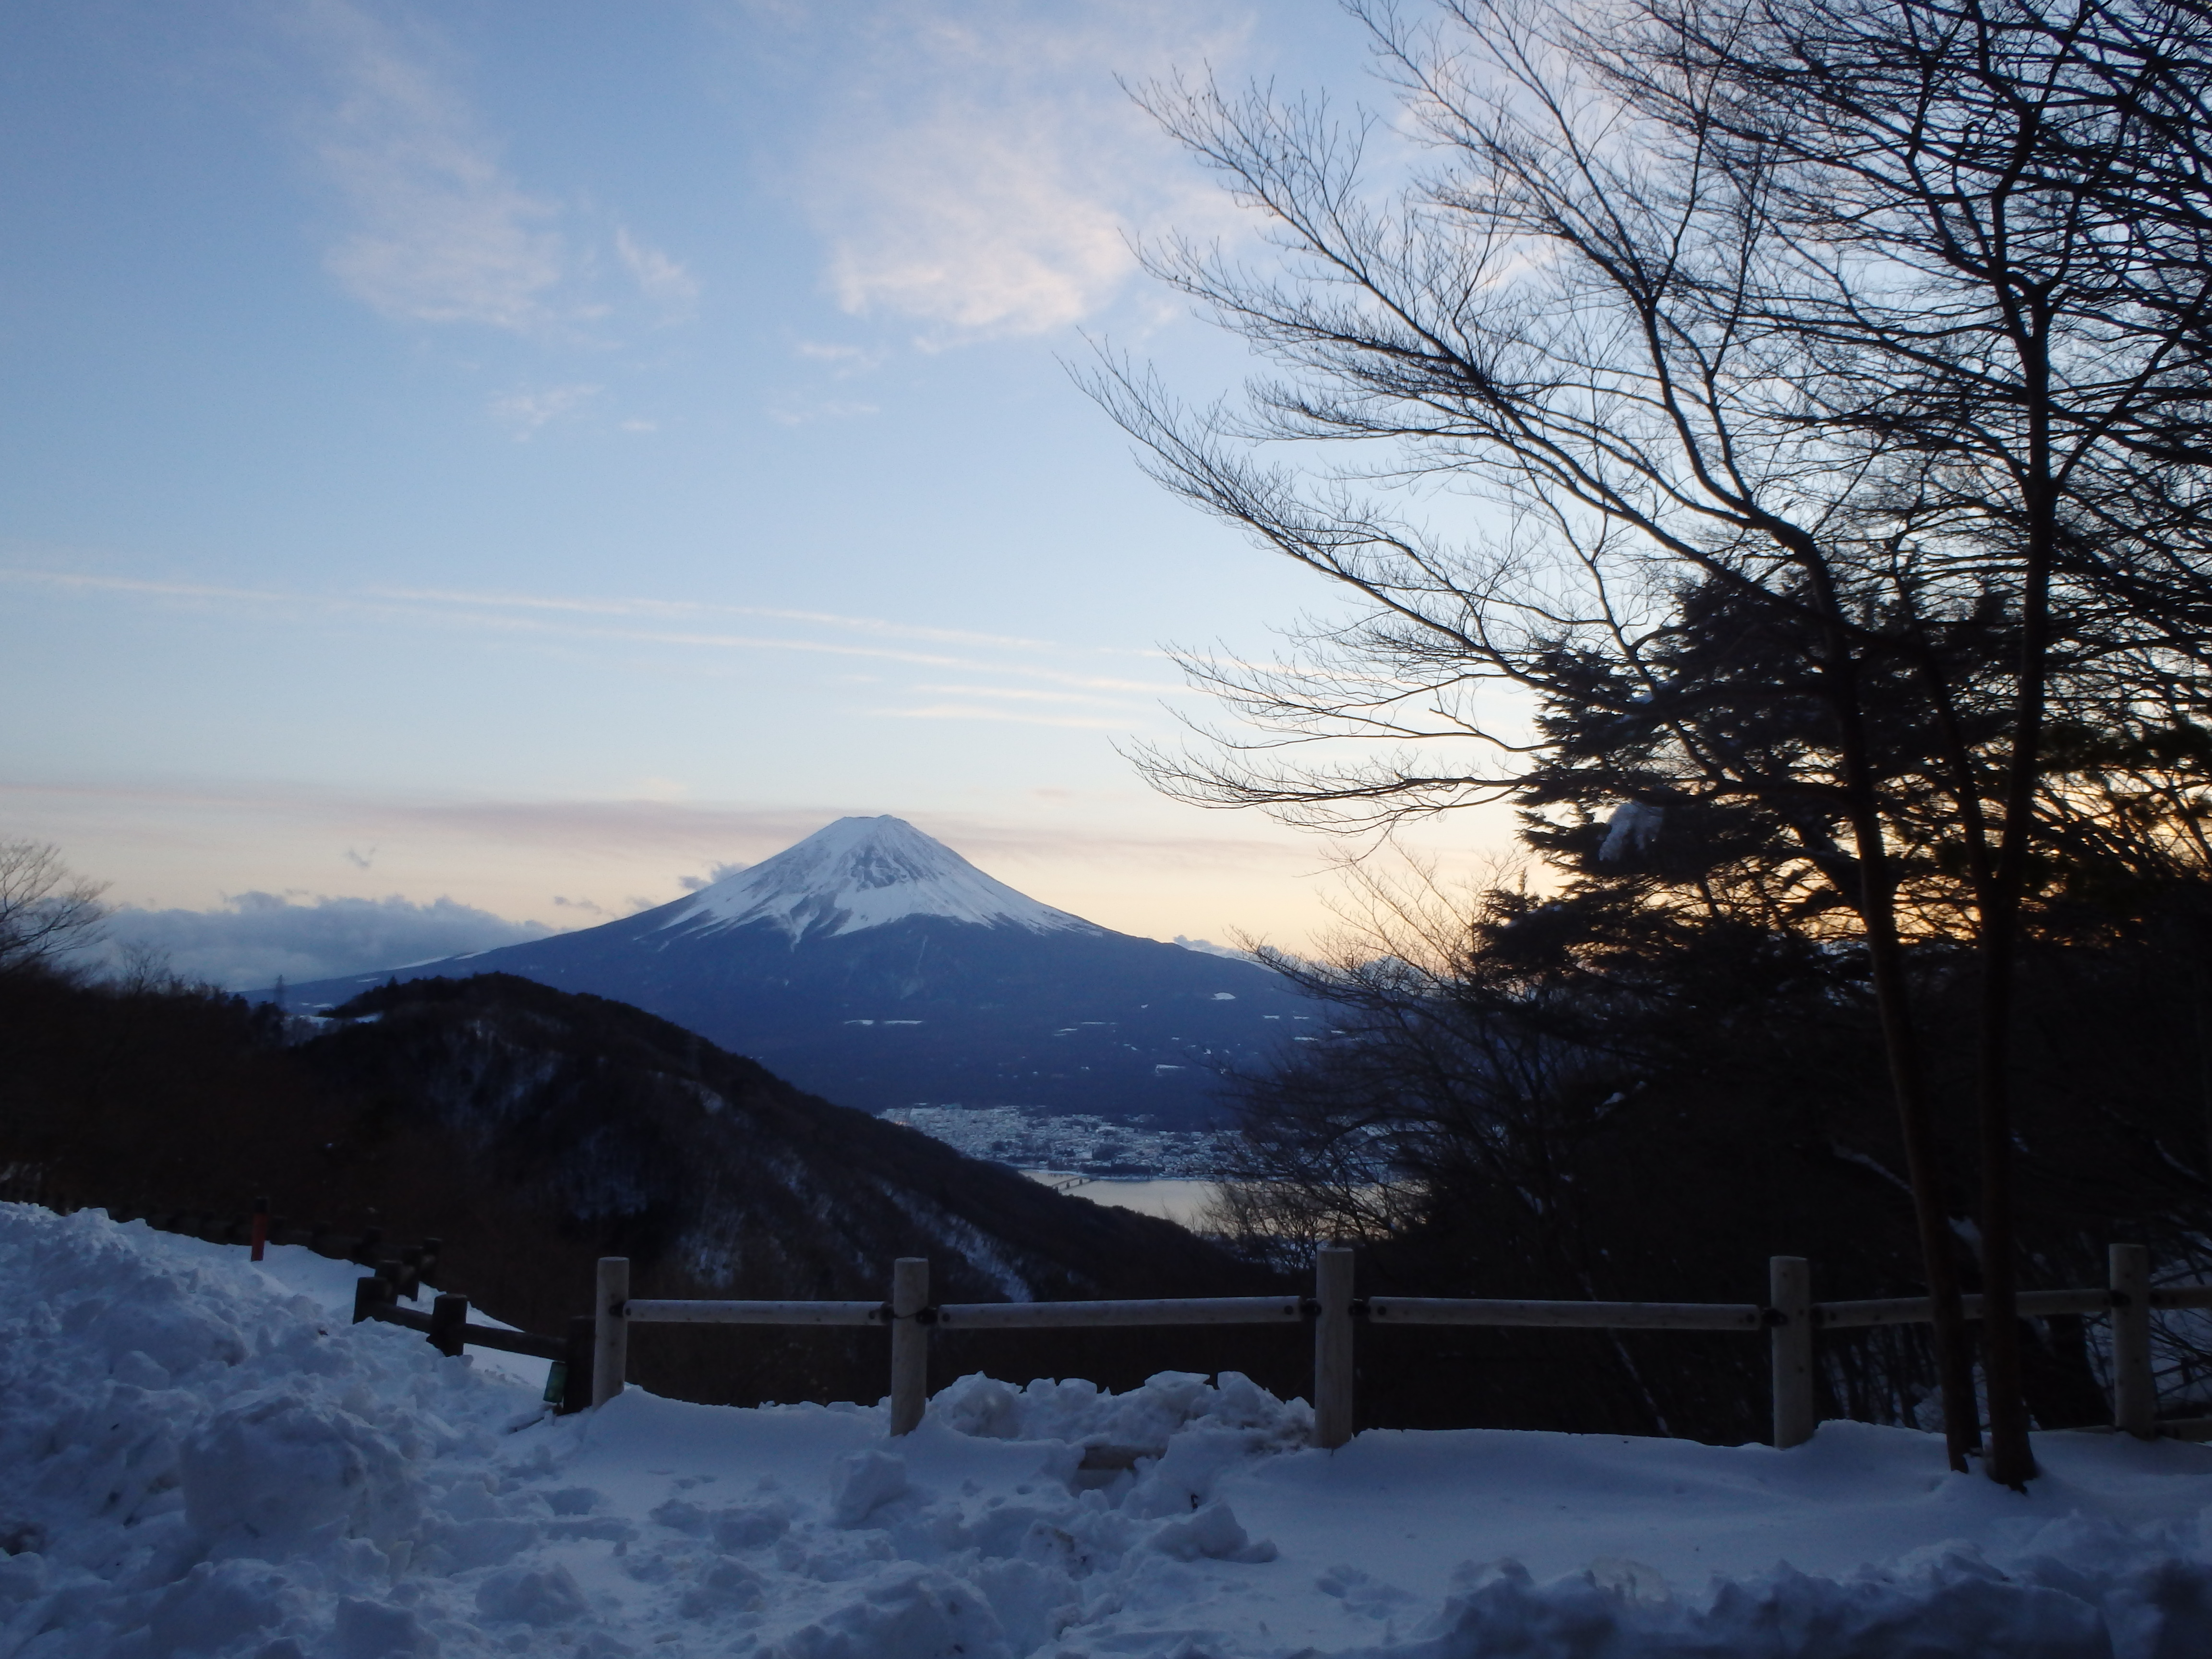 http://www.yamanashi-kankou.jp/blog/p5Y3rV_30.jpg